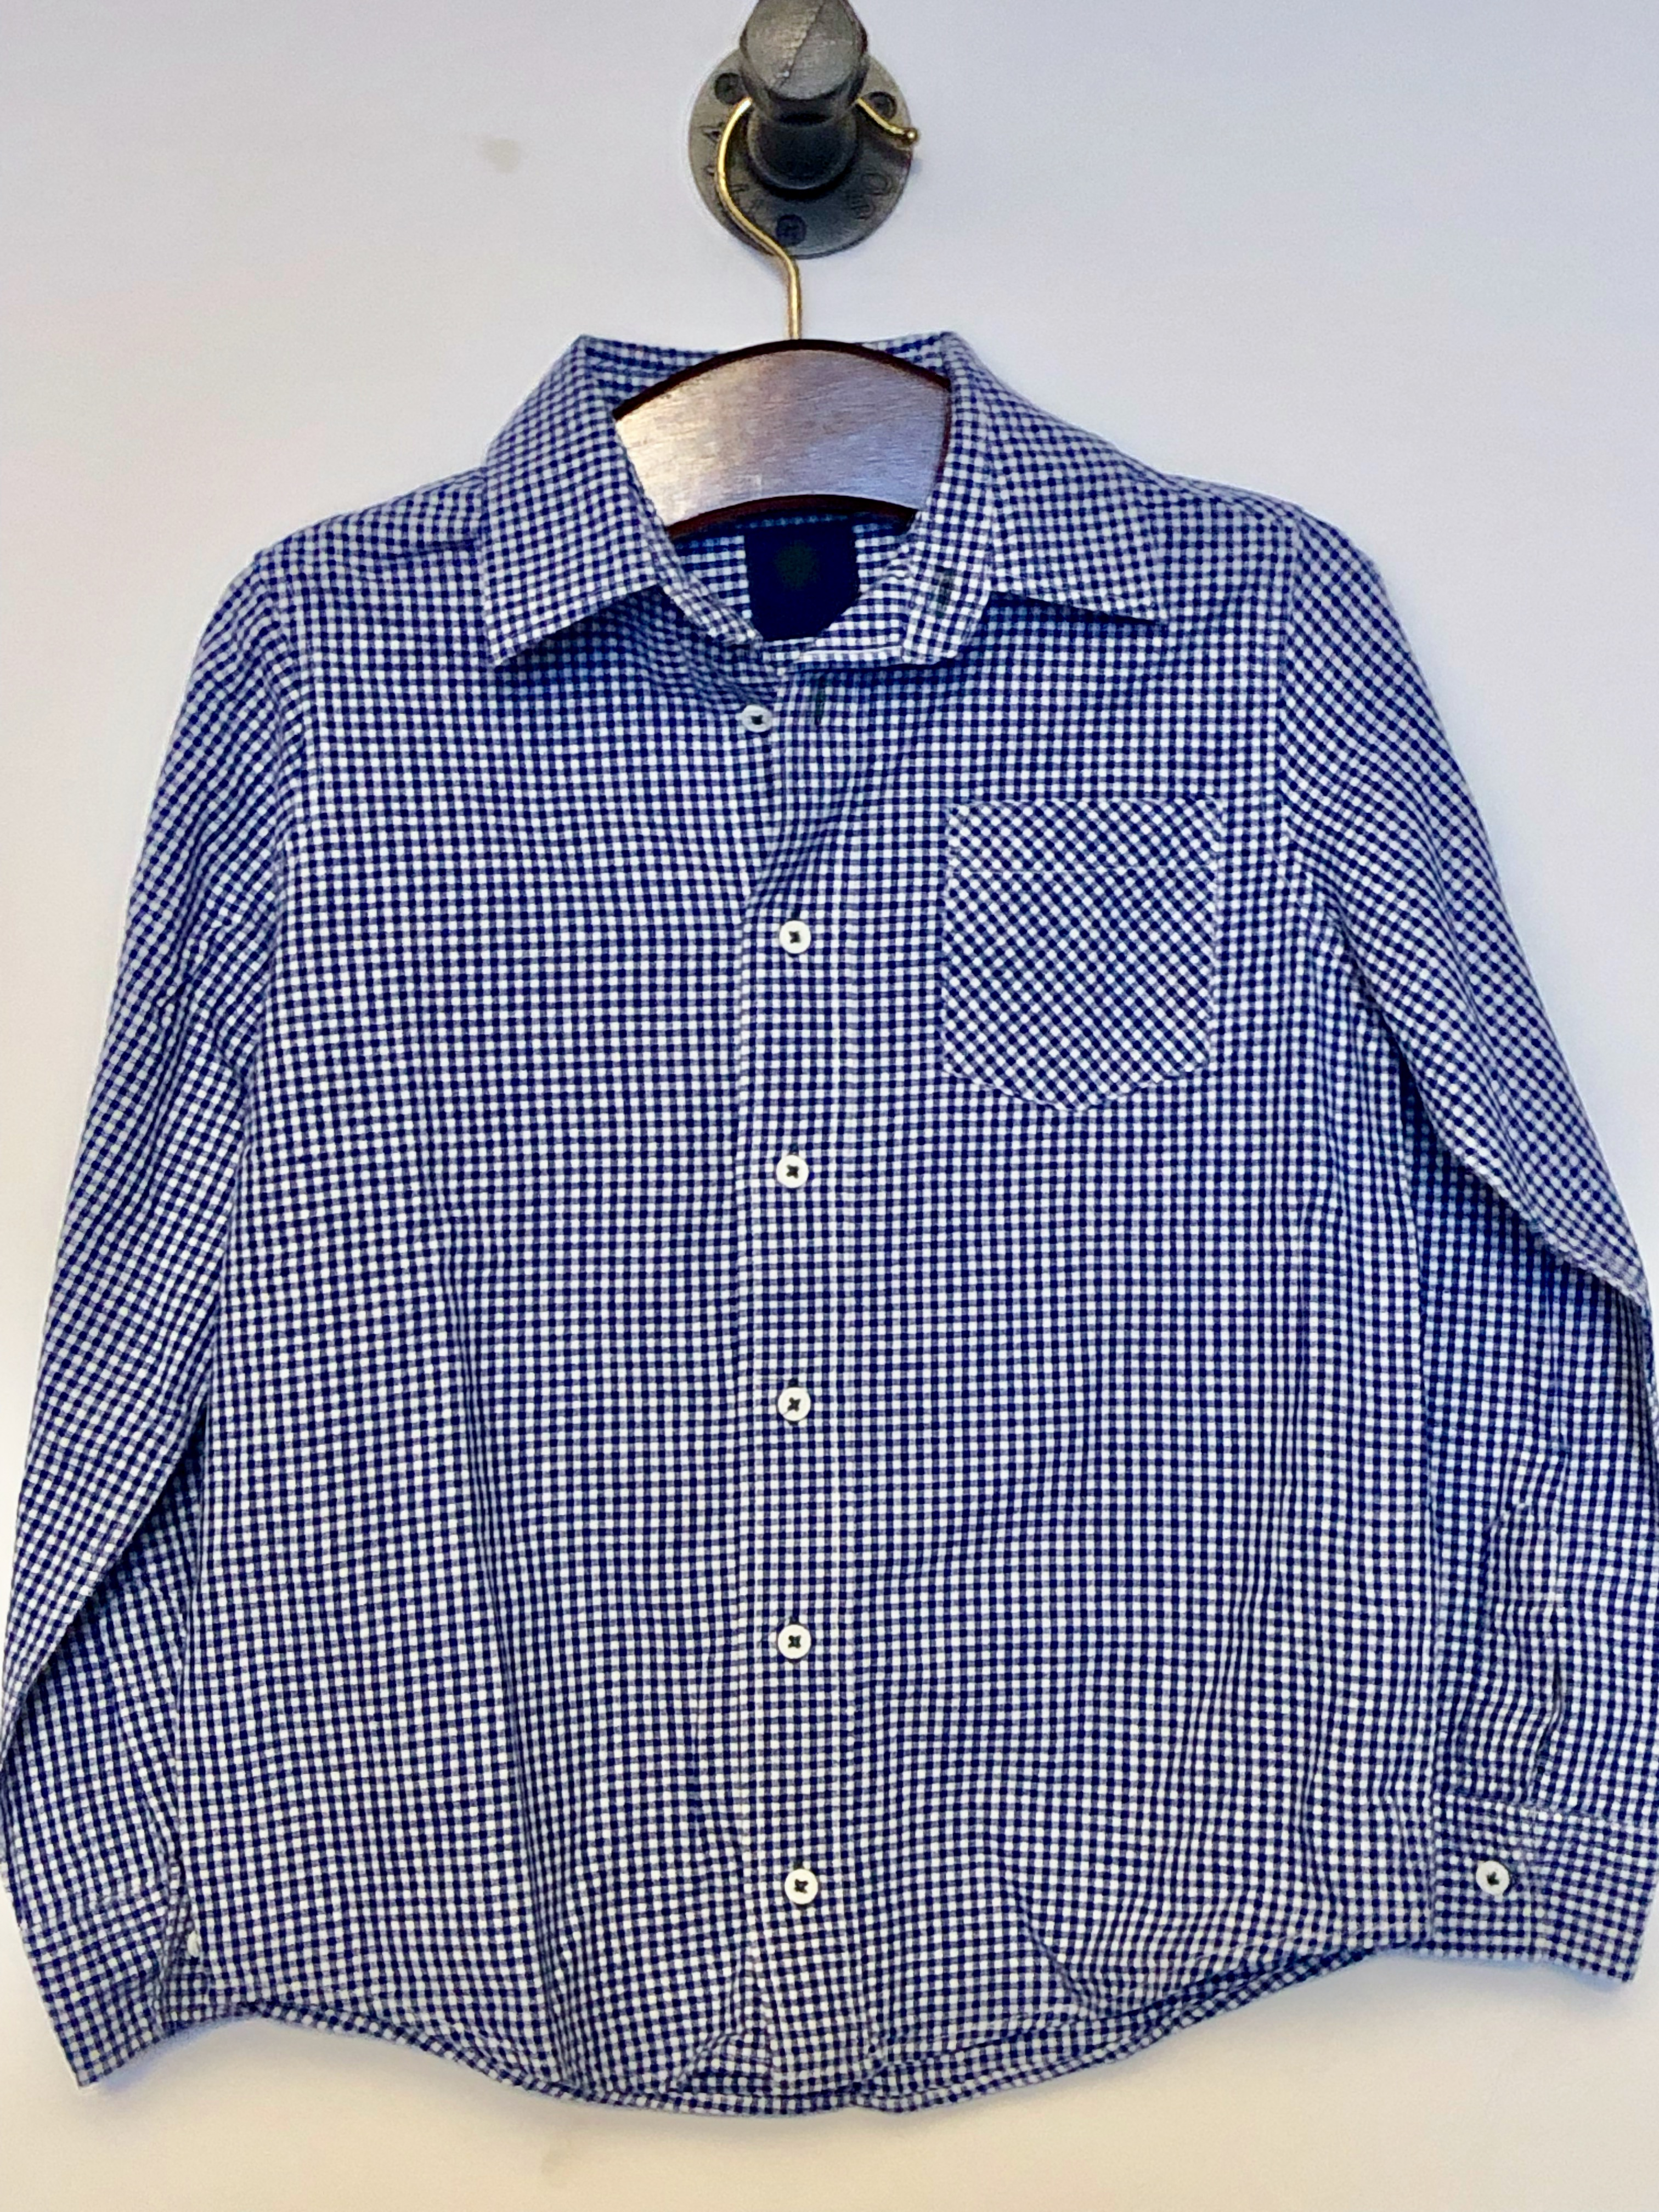 122-128 Trachtenhemd (ok)